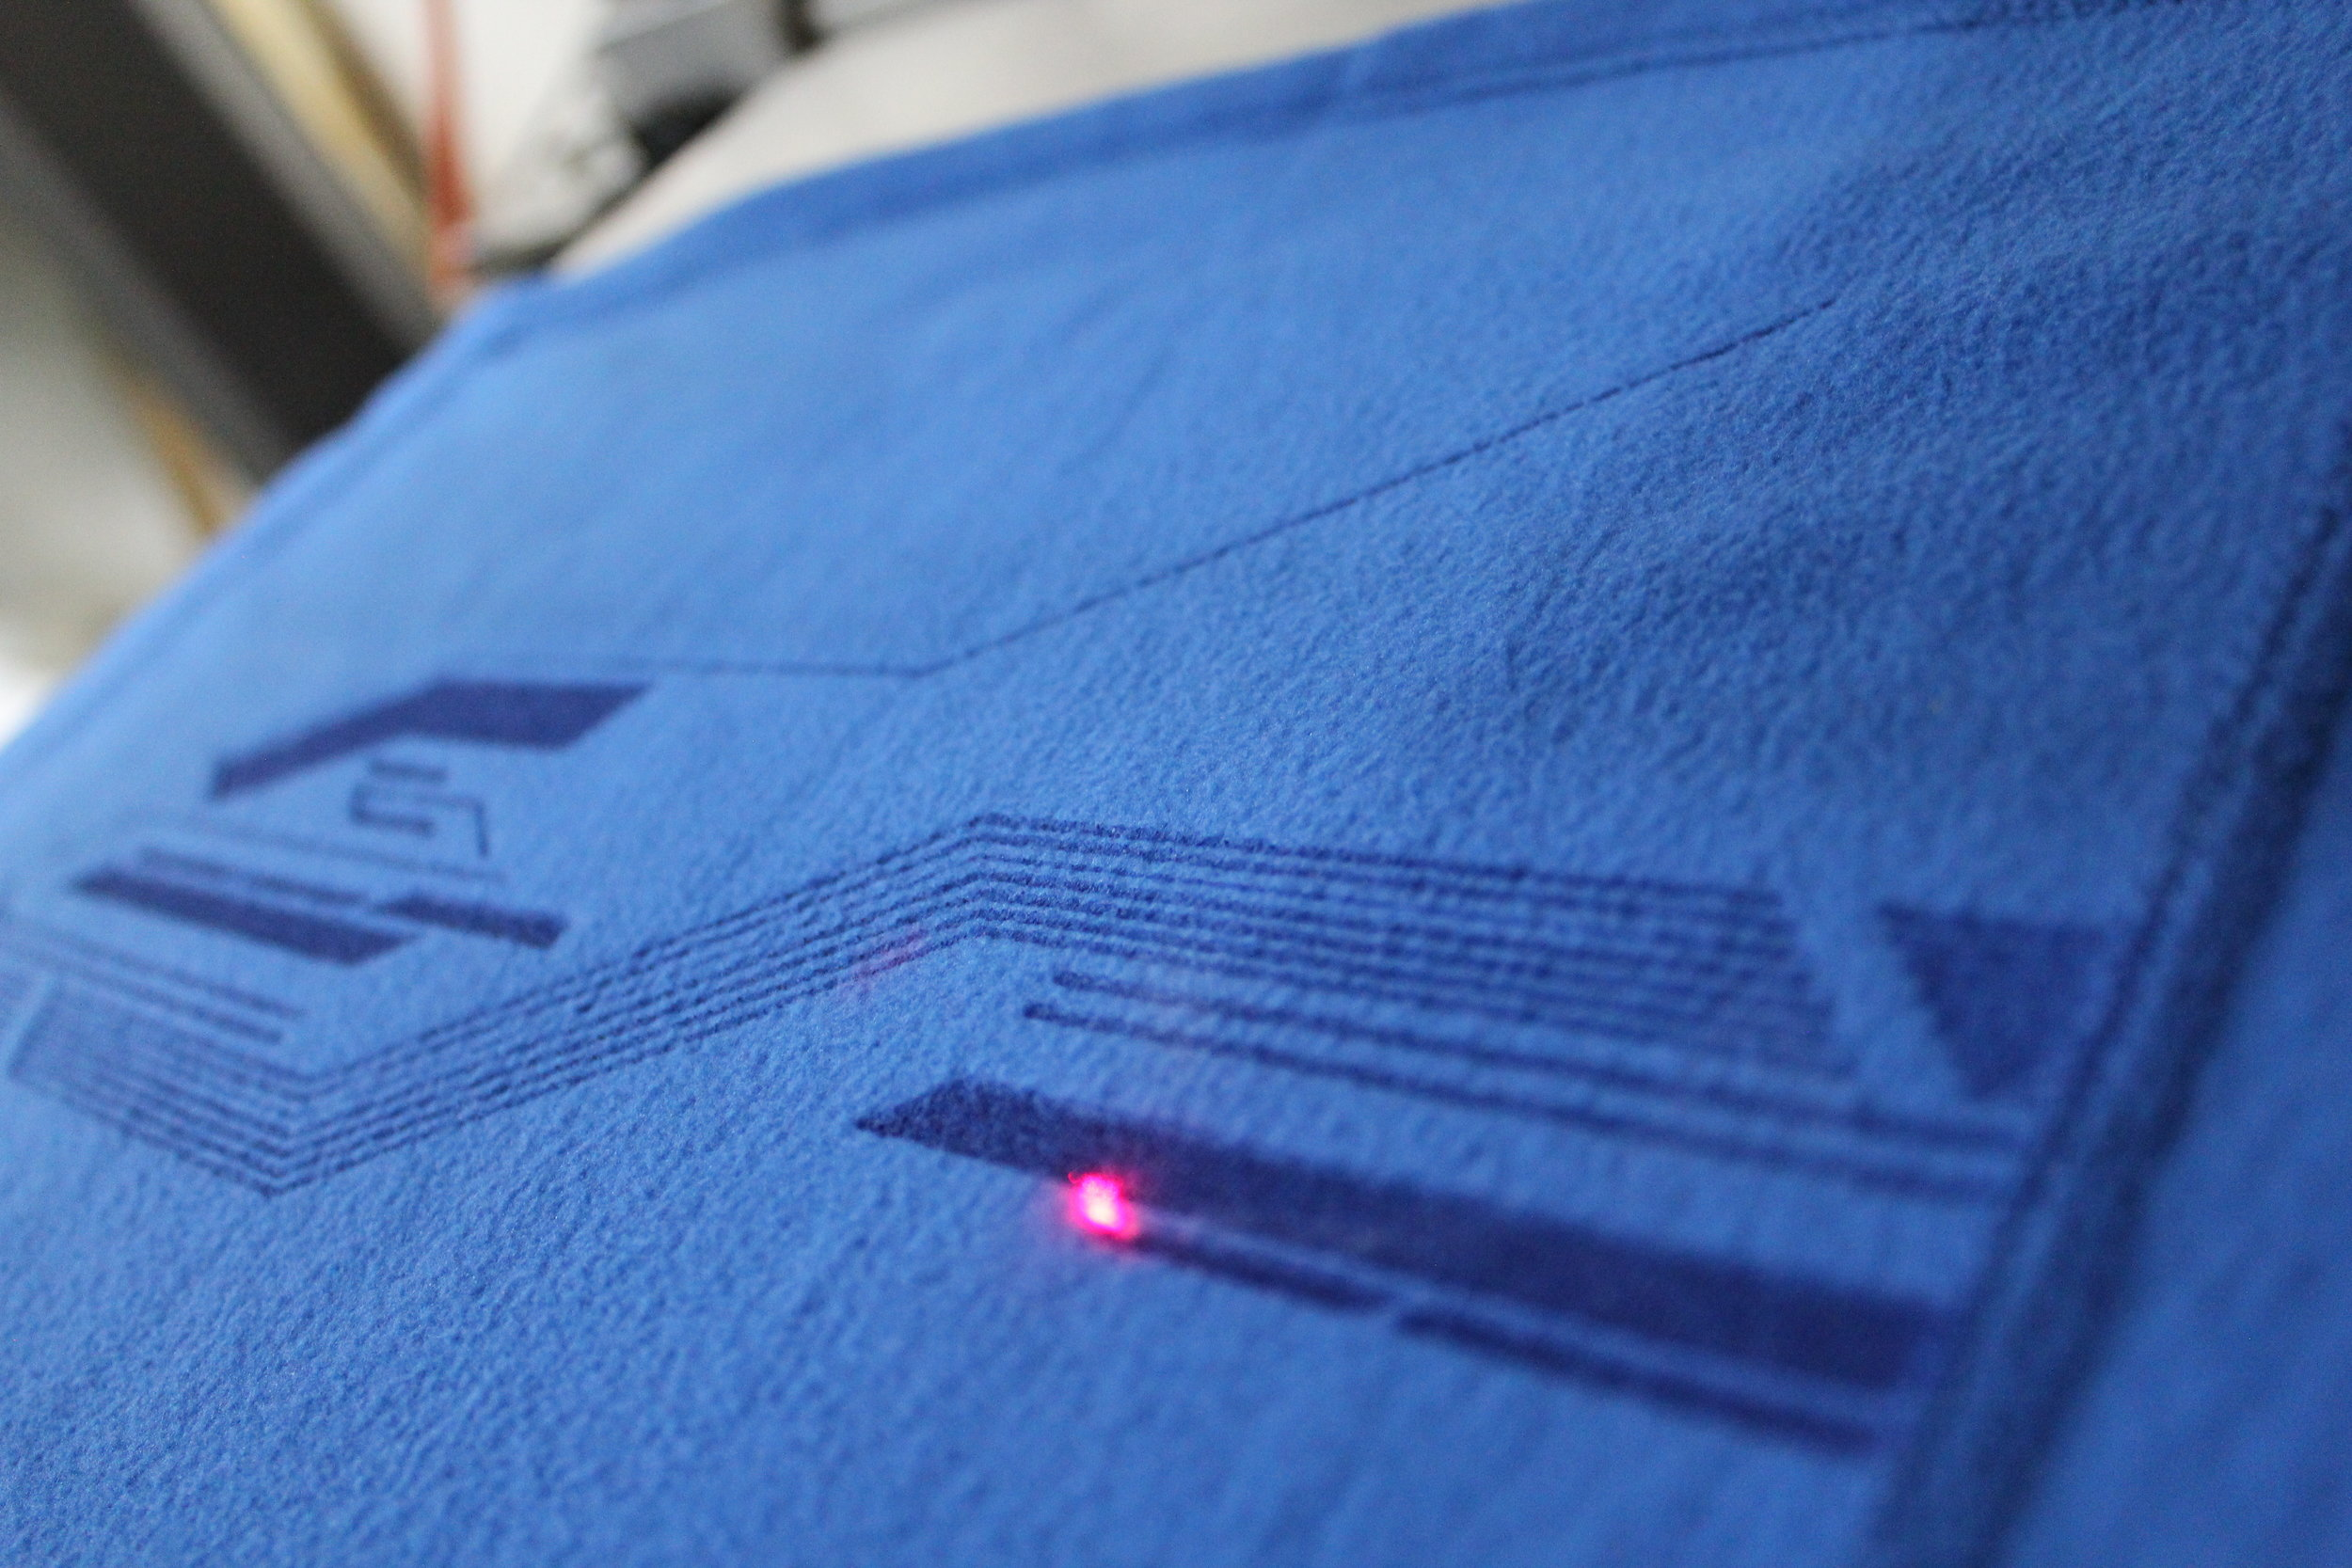 logounltd_laser_etching_embroidery_screen_printing_corporate_apparel_uniform_custom_tshirts_uniforms_dye_sublimation_kirkland_bellevue_seattle_redmond_branded_merchandise_promotional_products_logo_untd (99).JPG